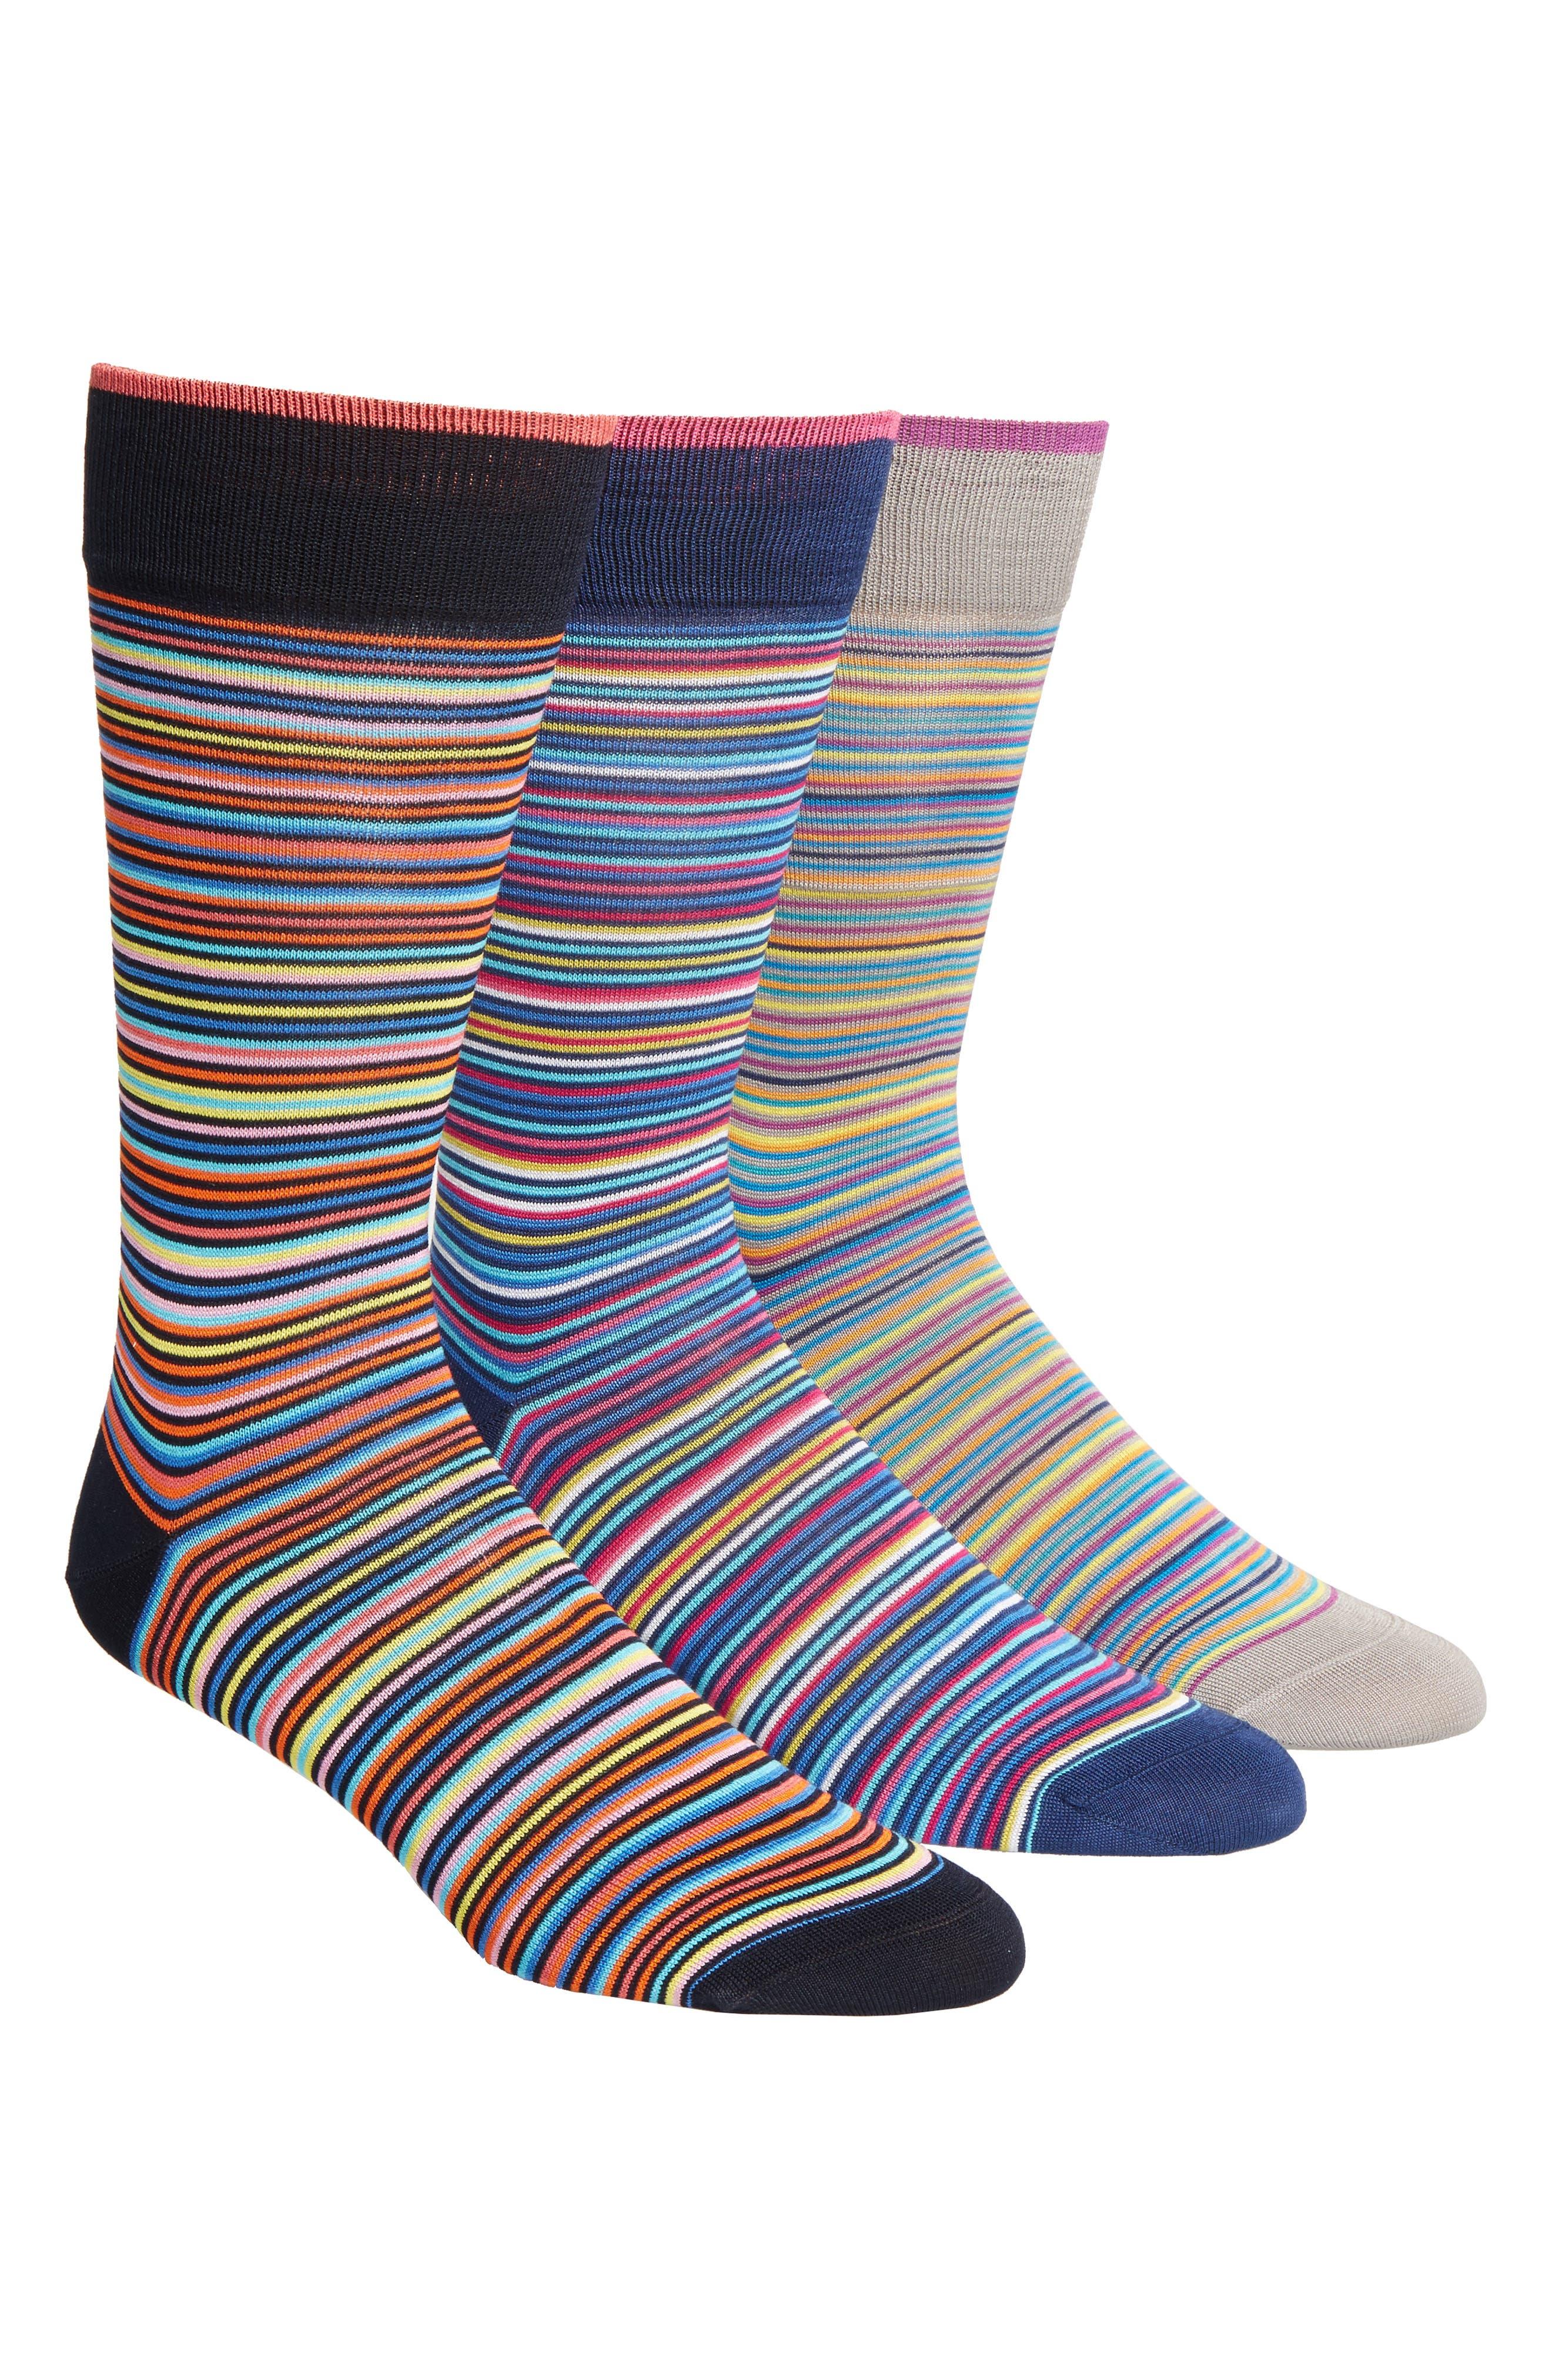 3-Pack Cotton Blend Socks,                         Main,                         color, 015